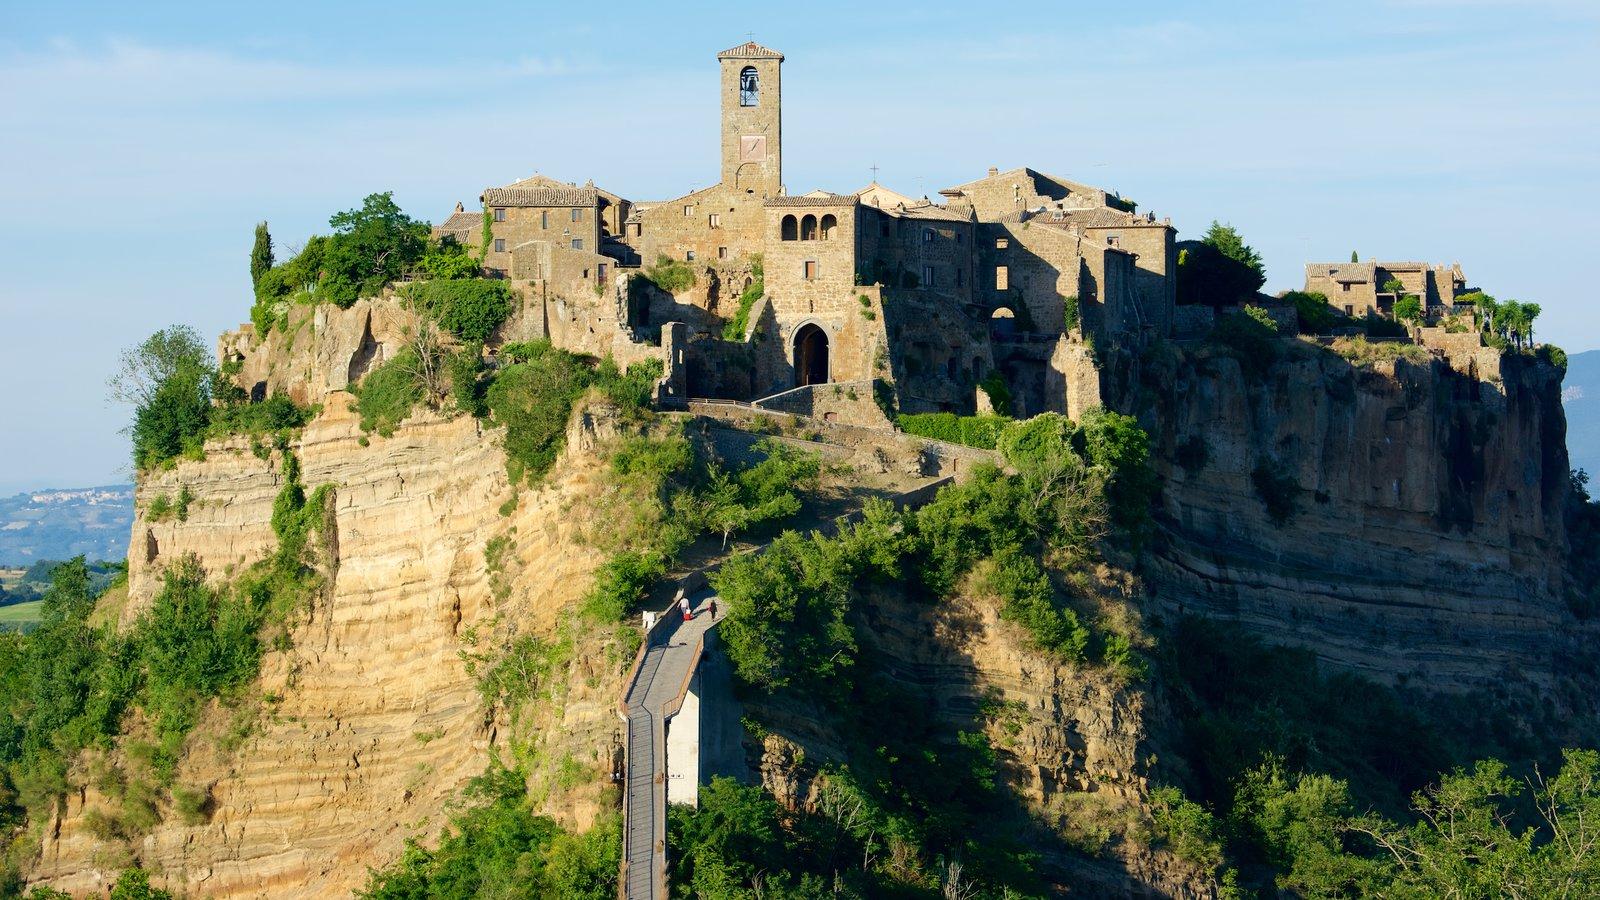 Bagnoregio que inclui um castelo e arquitetura de patrimônio